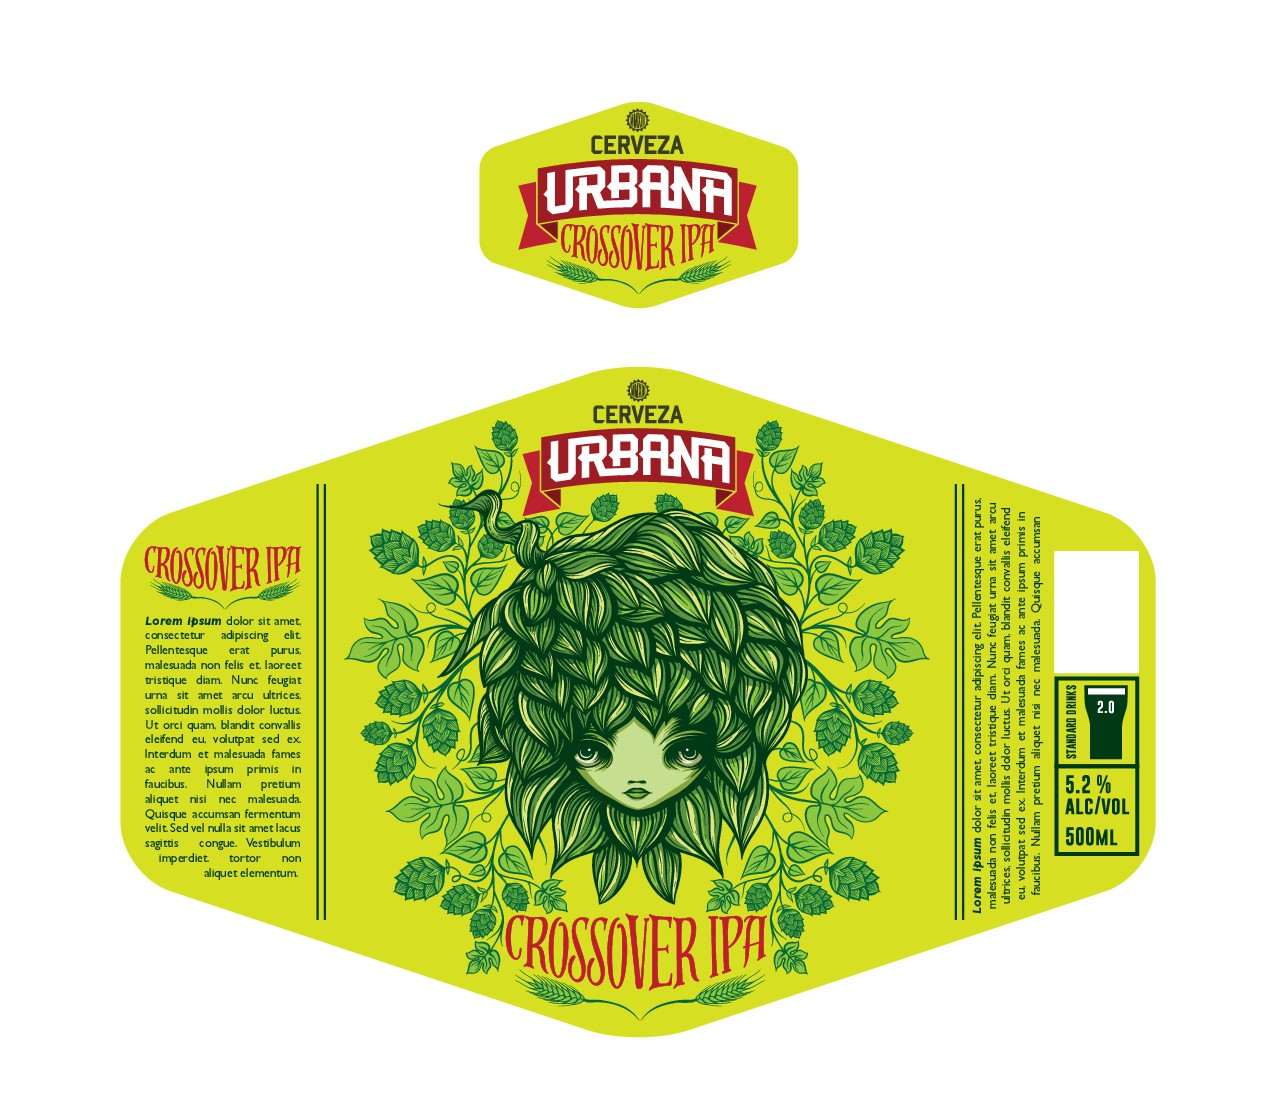 Cerveza Urbana brand label needed for Bottle.